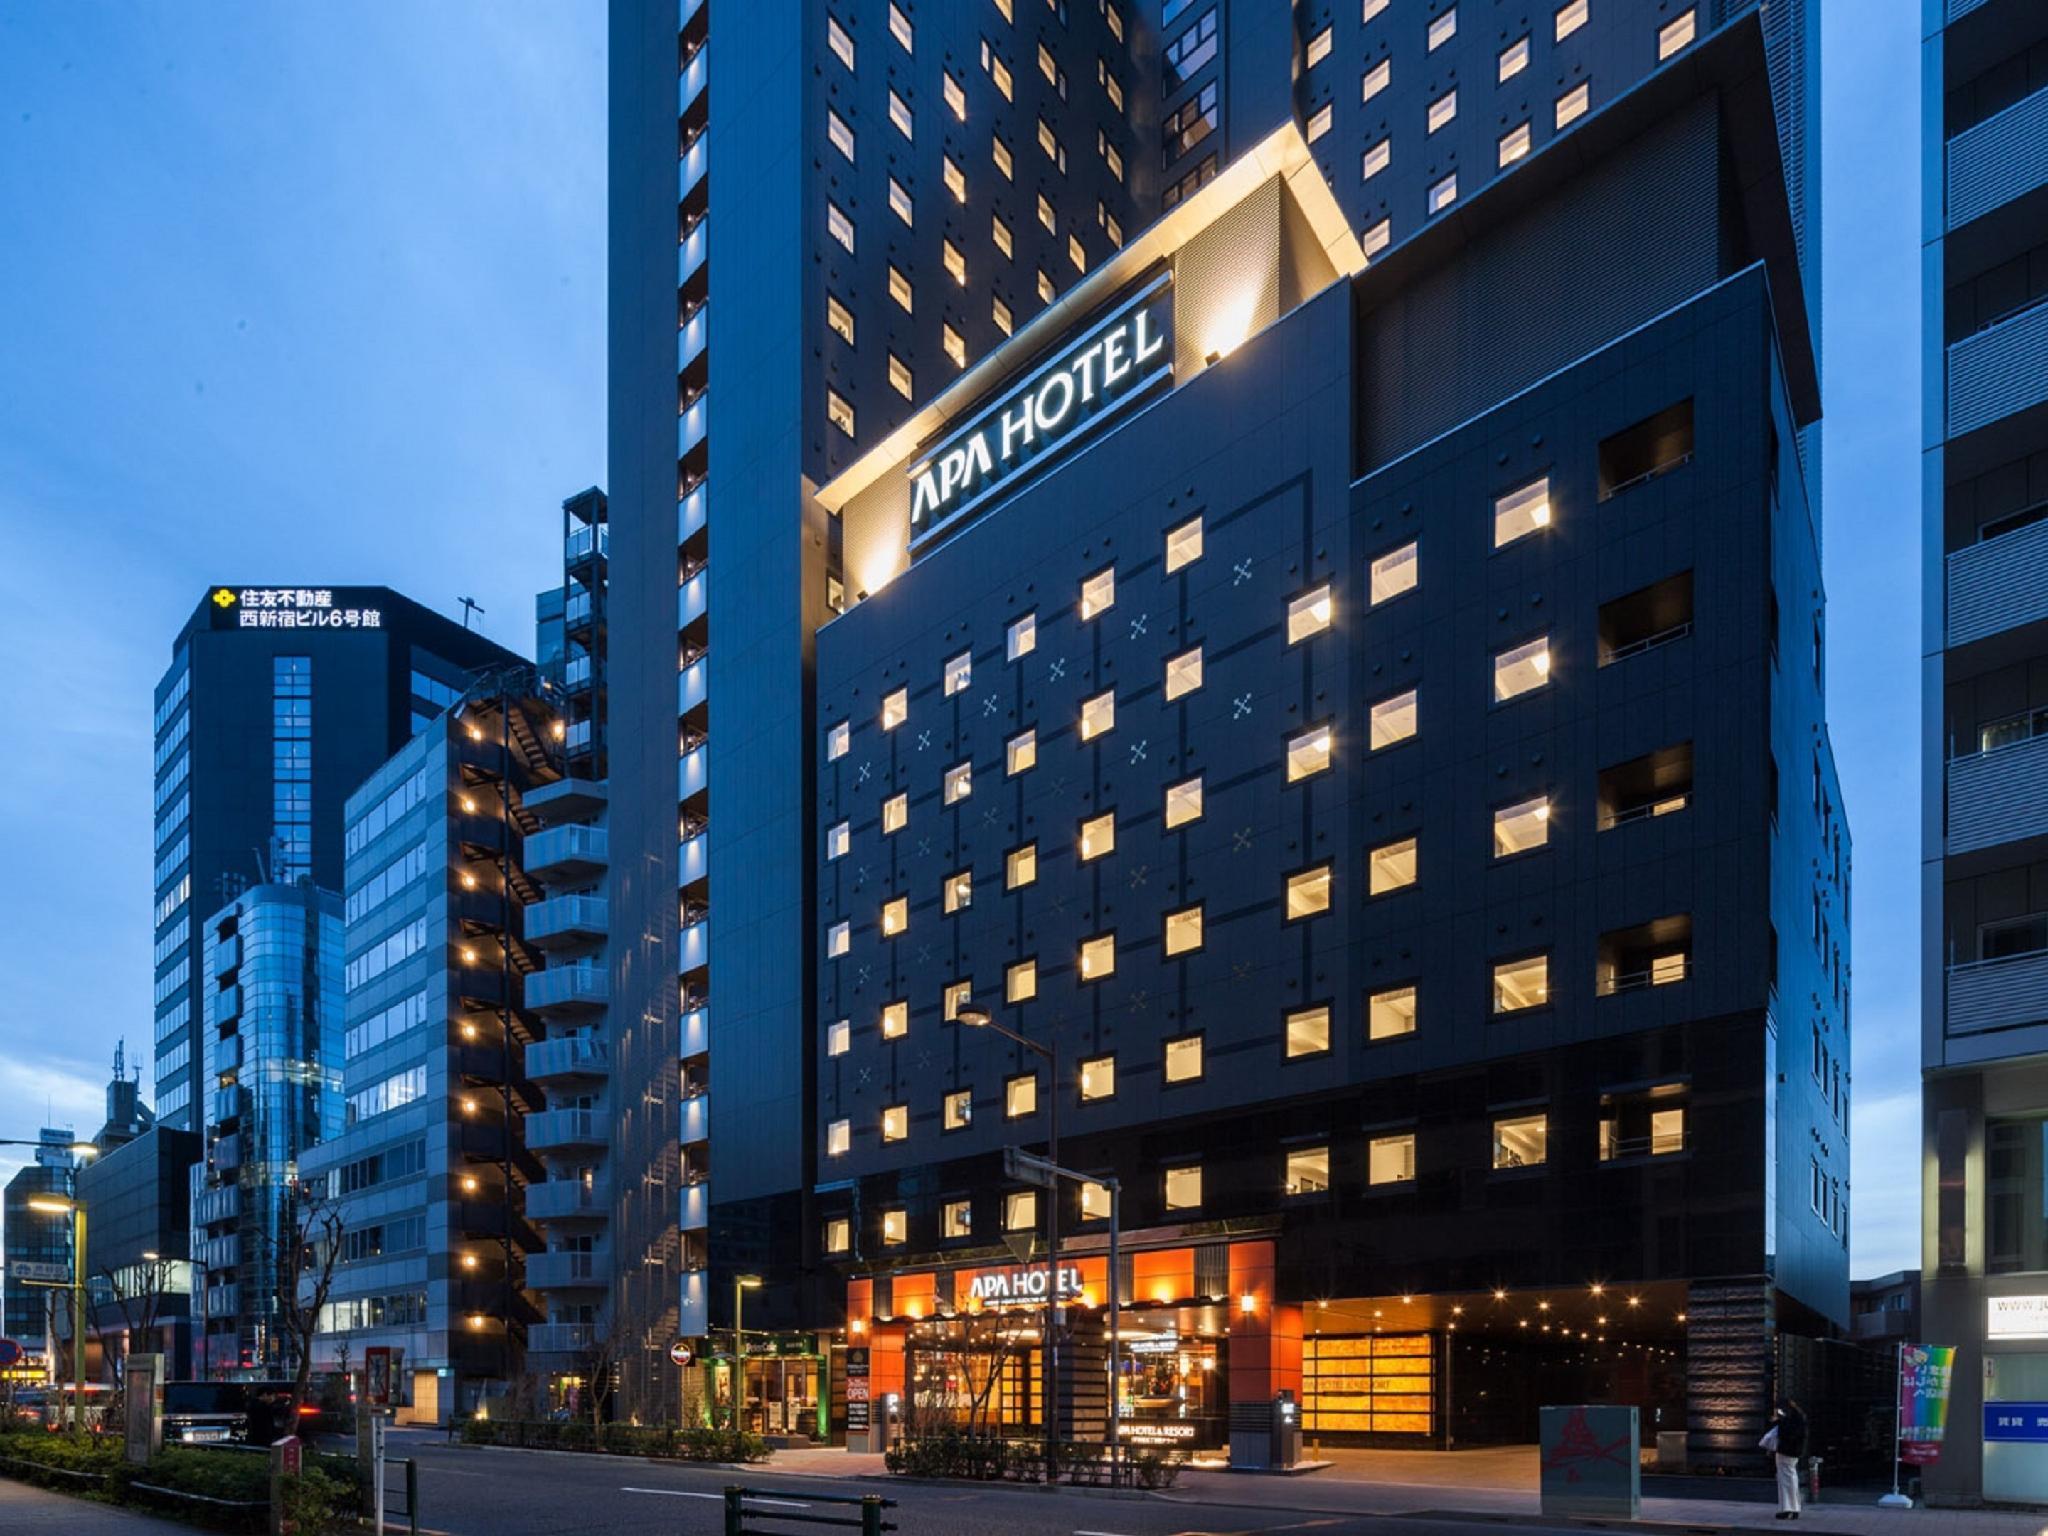 APA Hotel And Resort Nishishinjuku Gochome Eki Tower